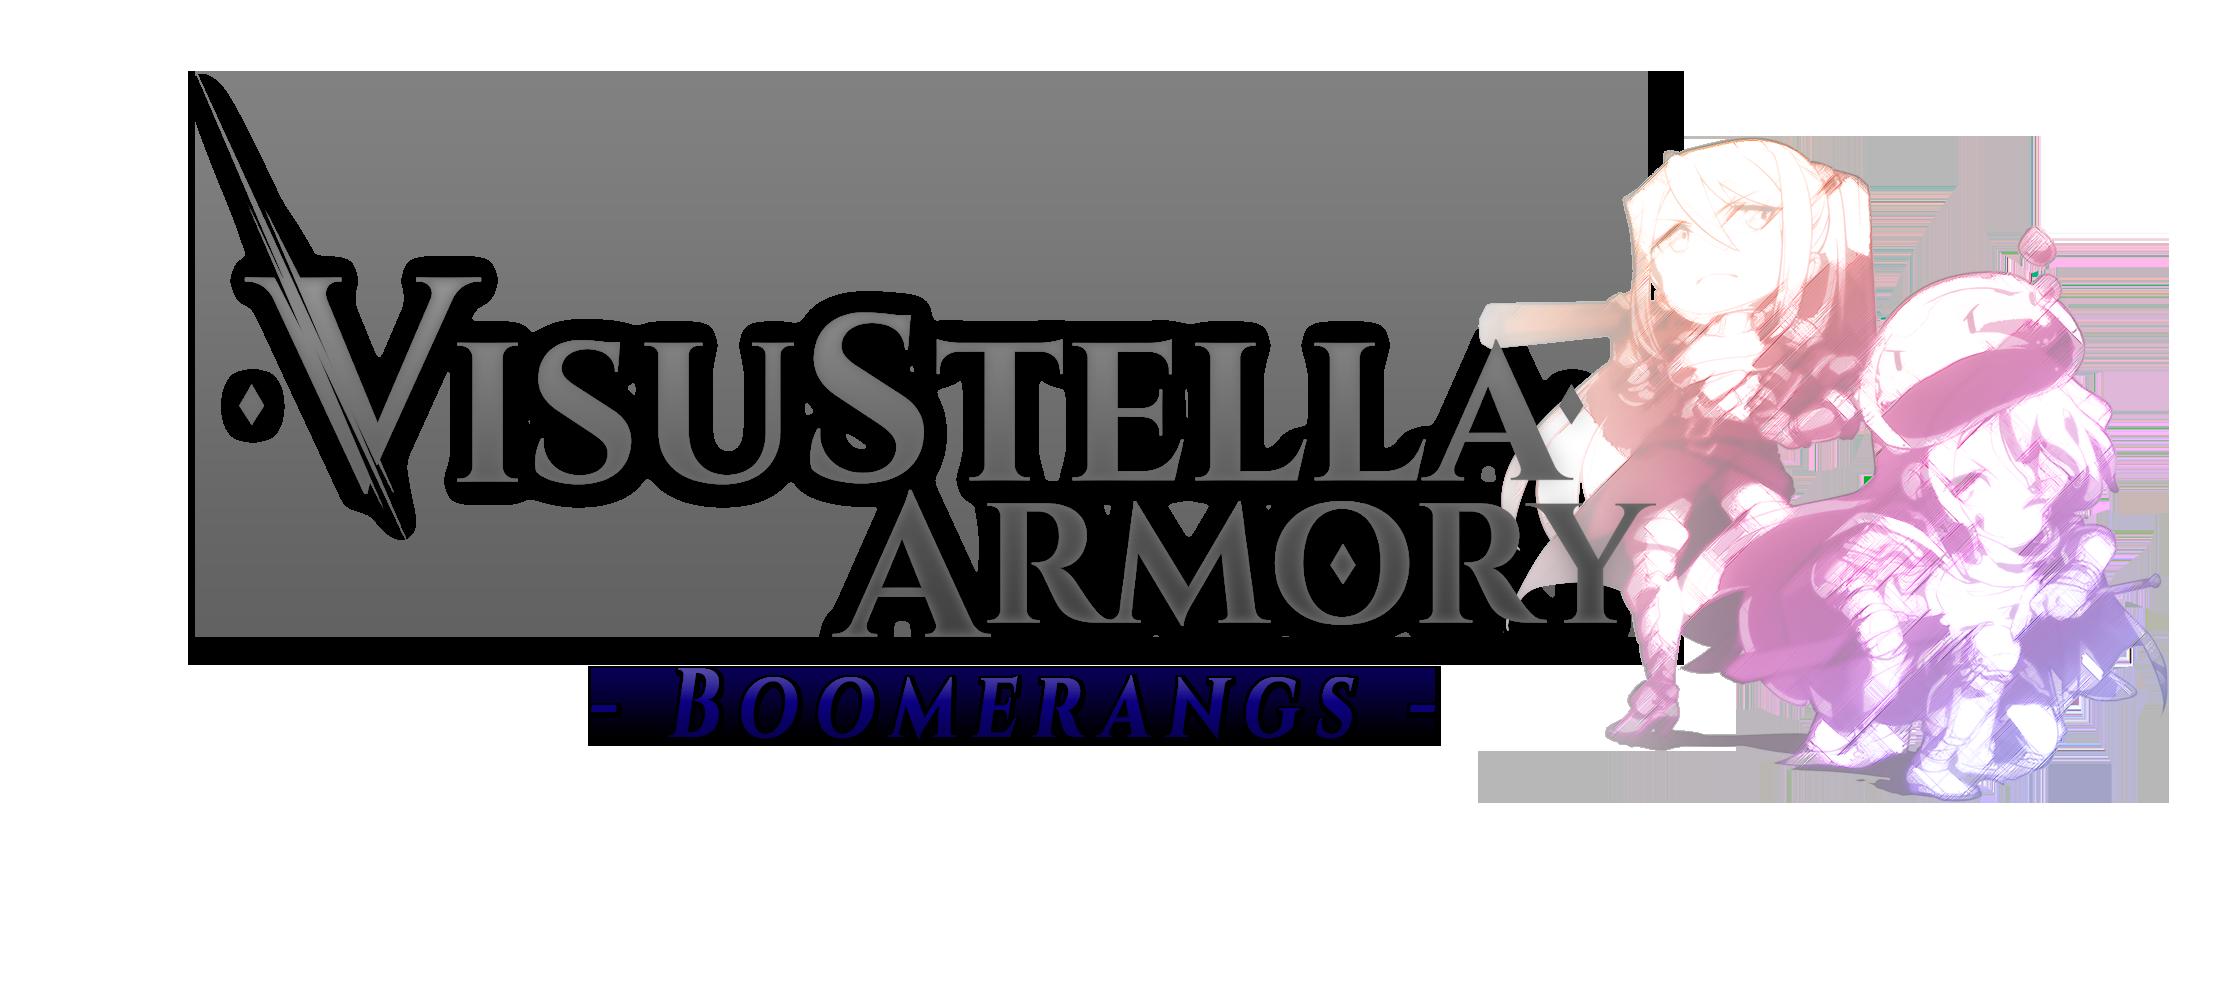 VisuStella Armory: Boomerangs